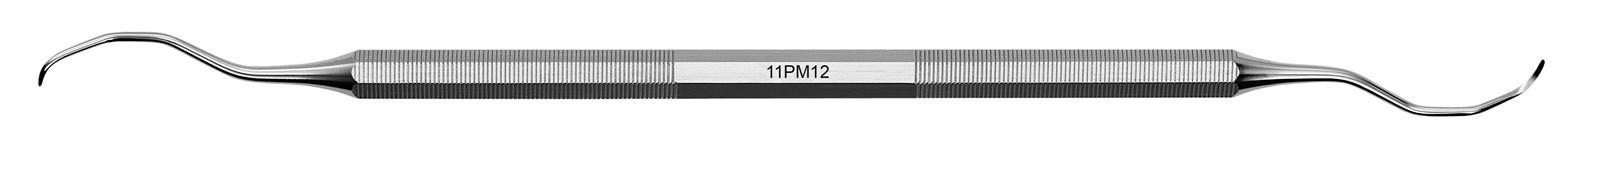 Kyreta Gracey Mini - 11PM12, ADEP fialový